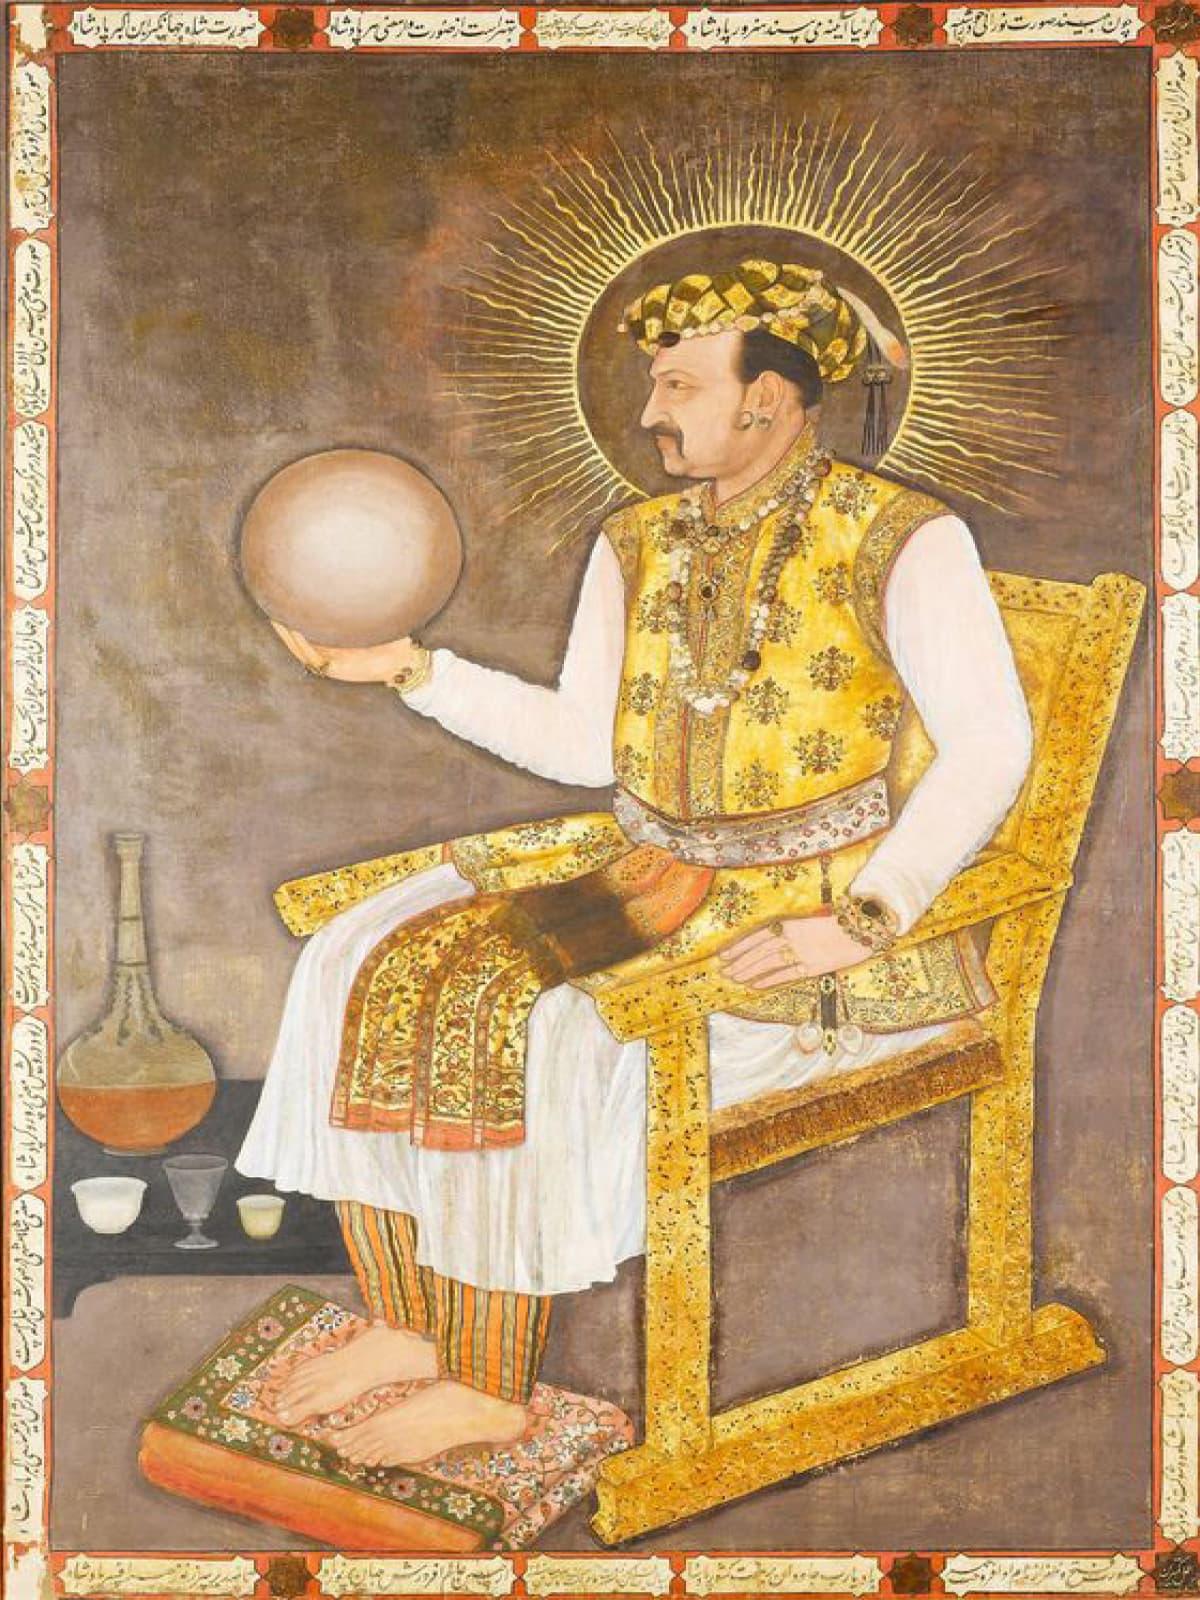 Mughal painter Abu al-Hasan's portrait of Emperor Jahangir circa 1600